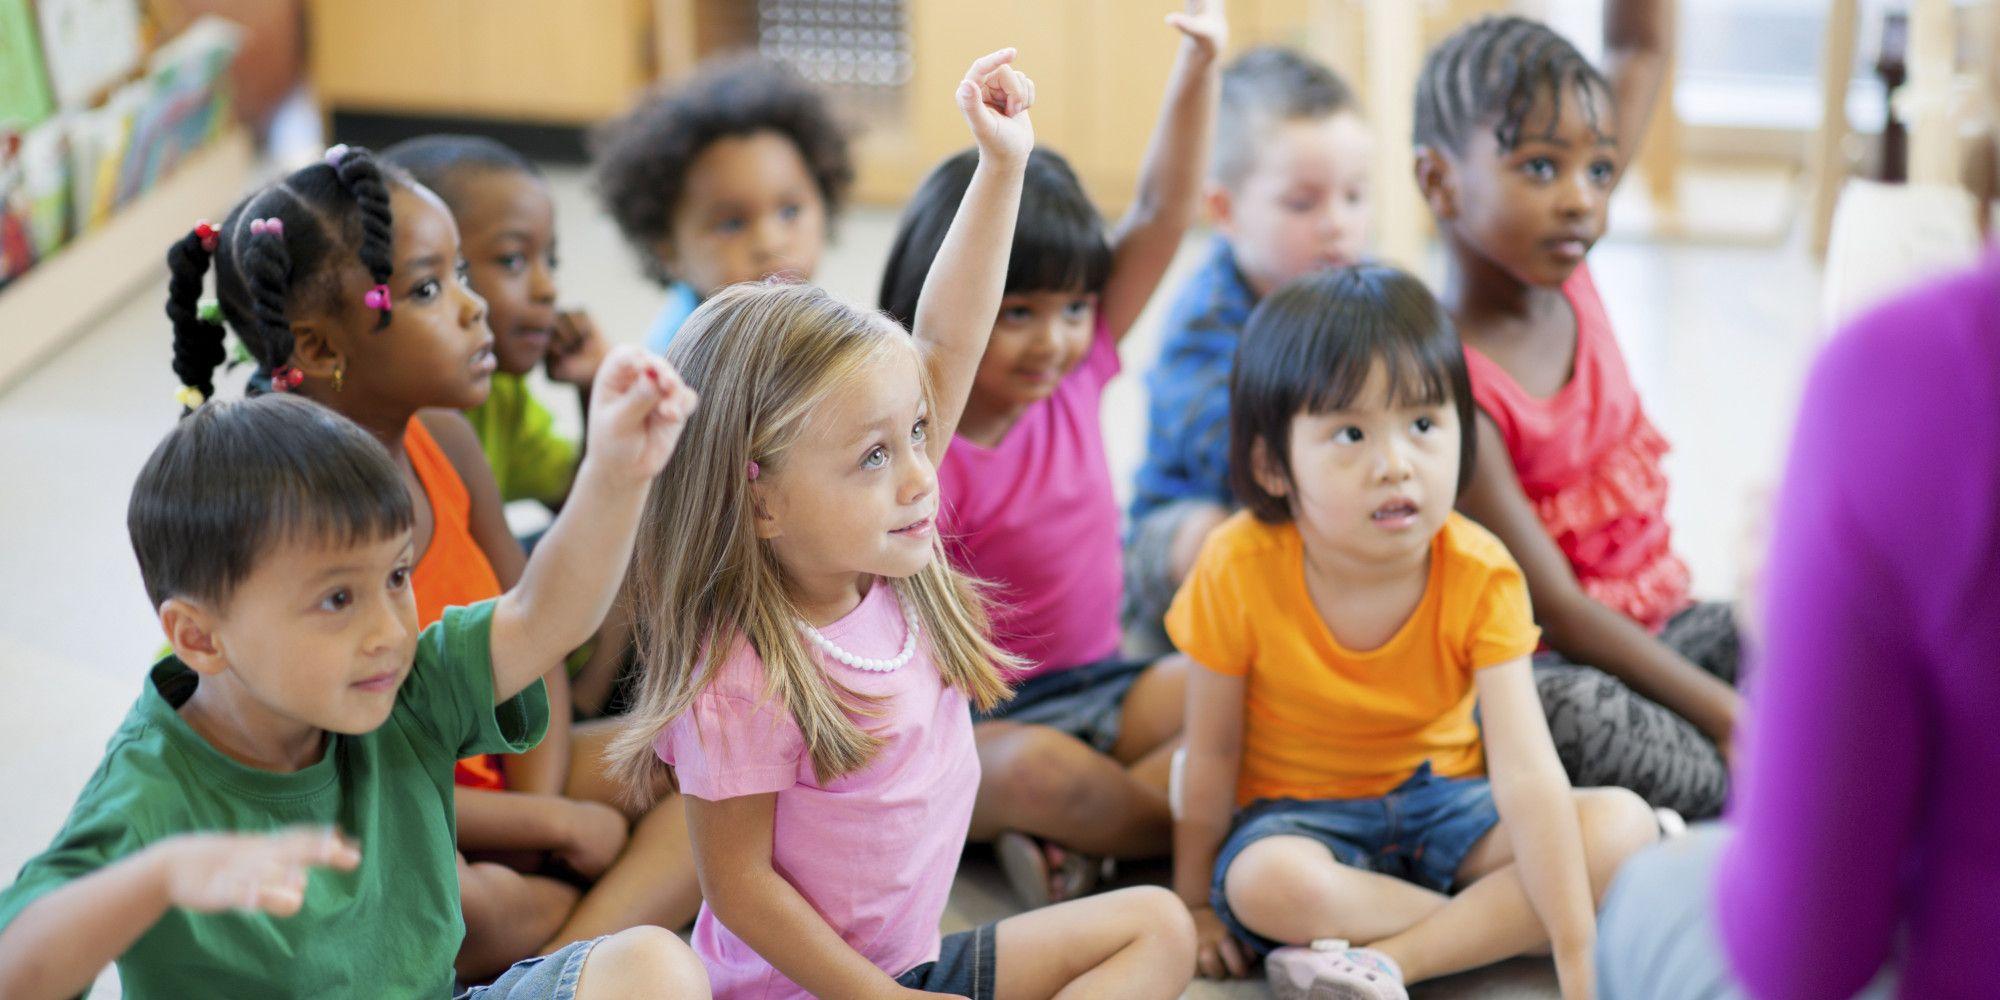 Democratic And Republican Voters Preschool